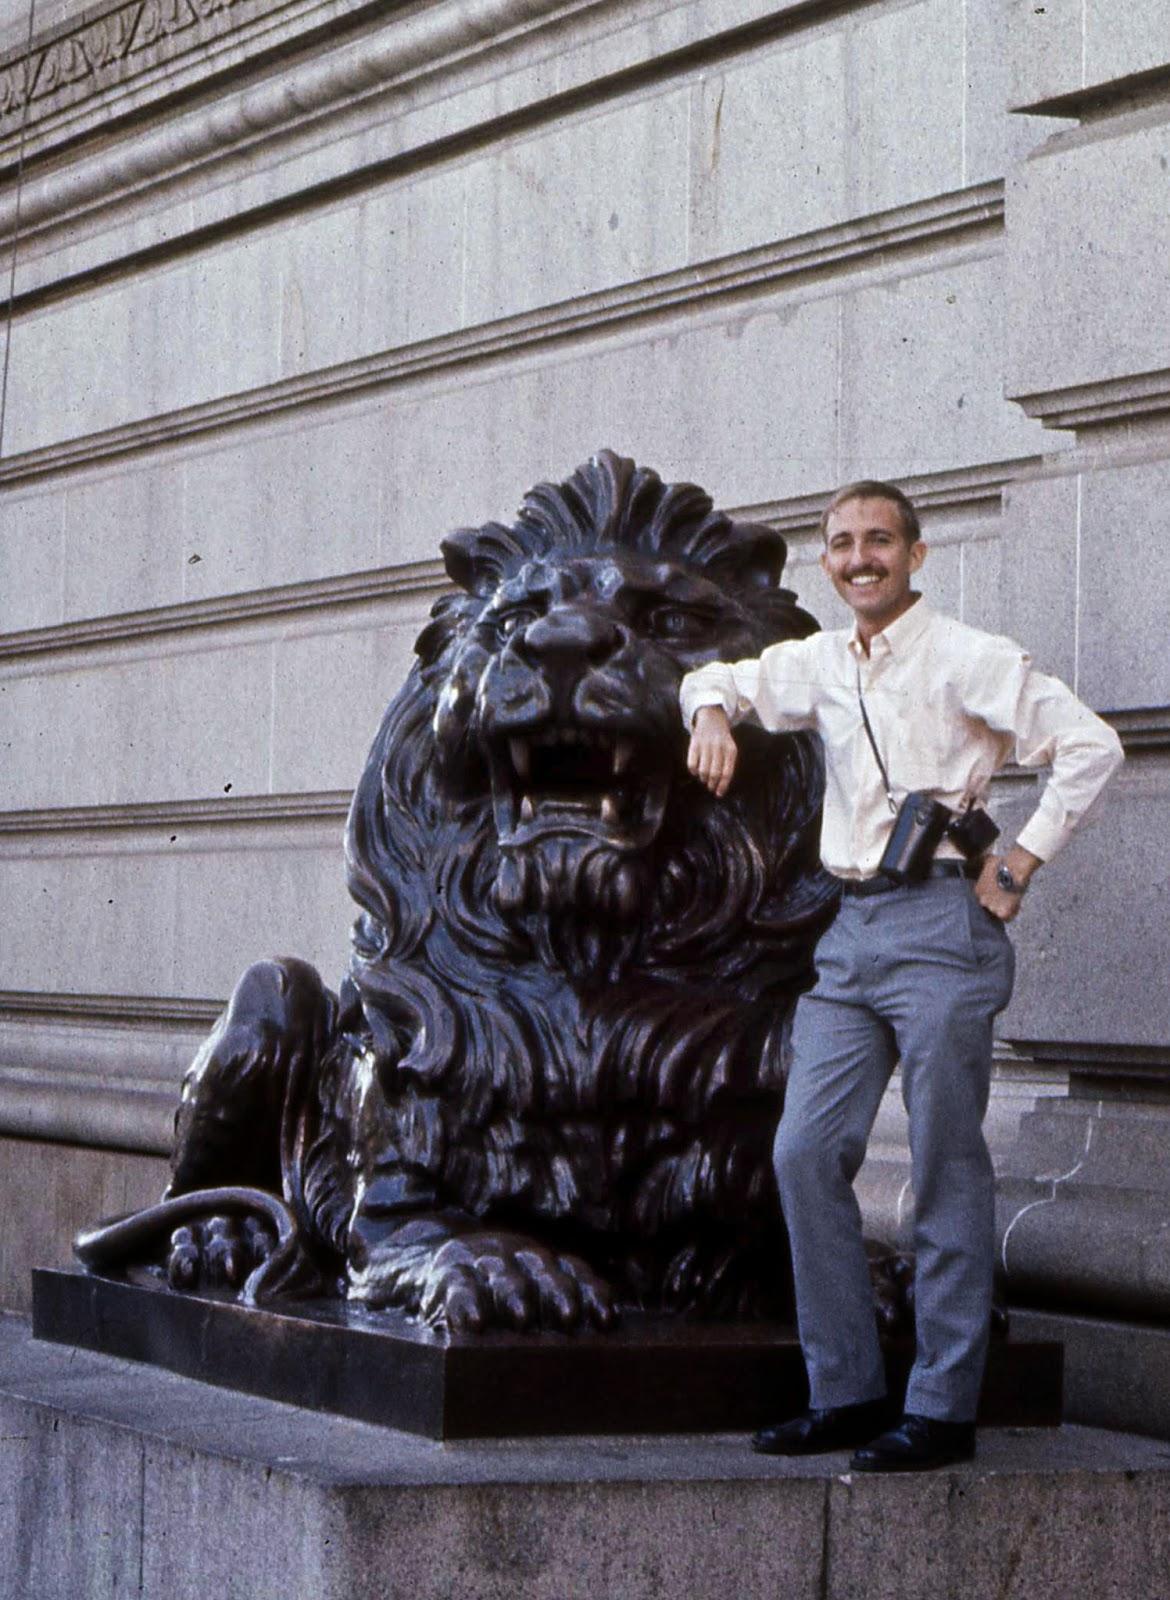 HSBC Bank Lion - Hong Kong 1969